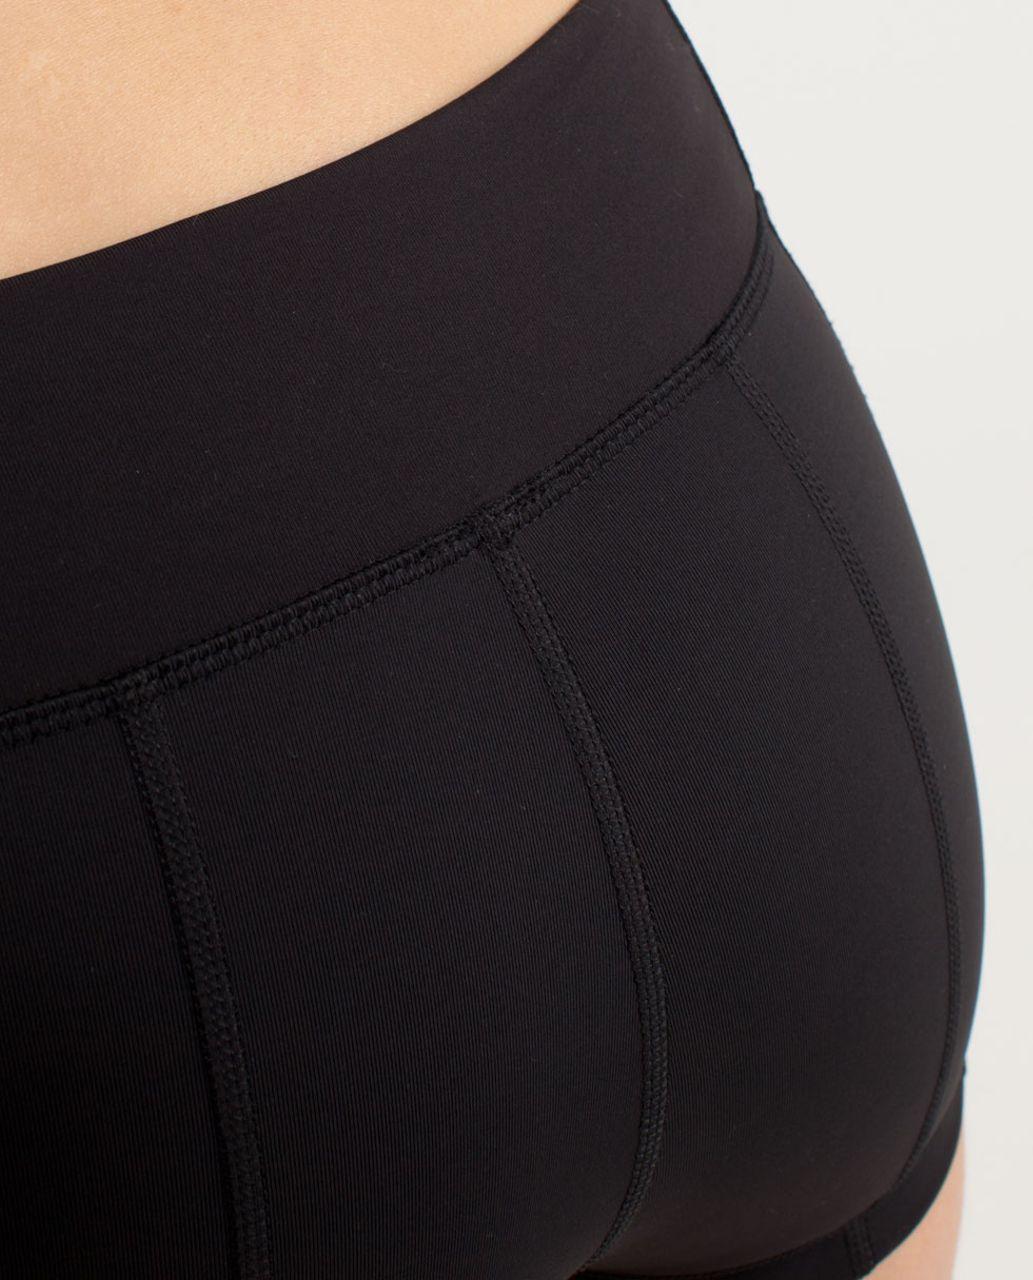 Lululemon Hot 'N Sweaty Short - Black